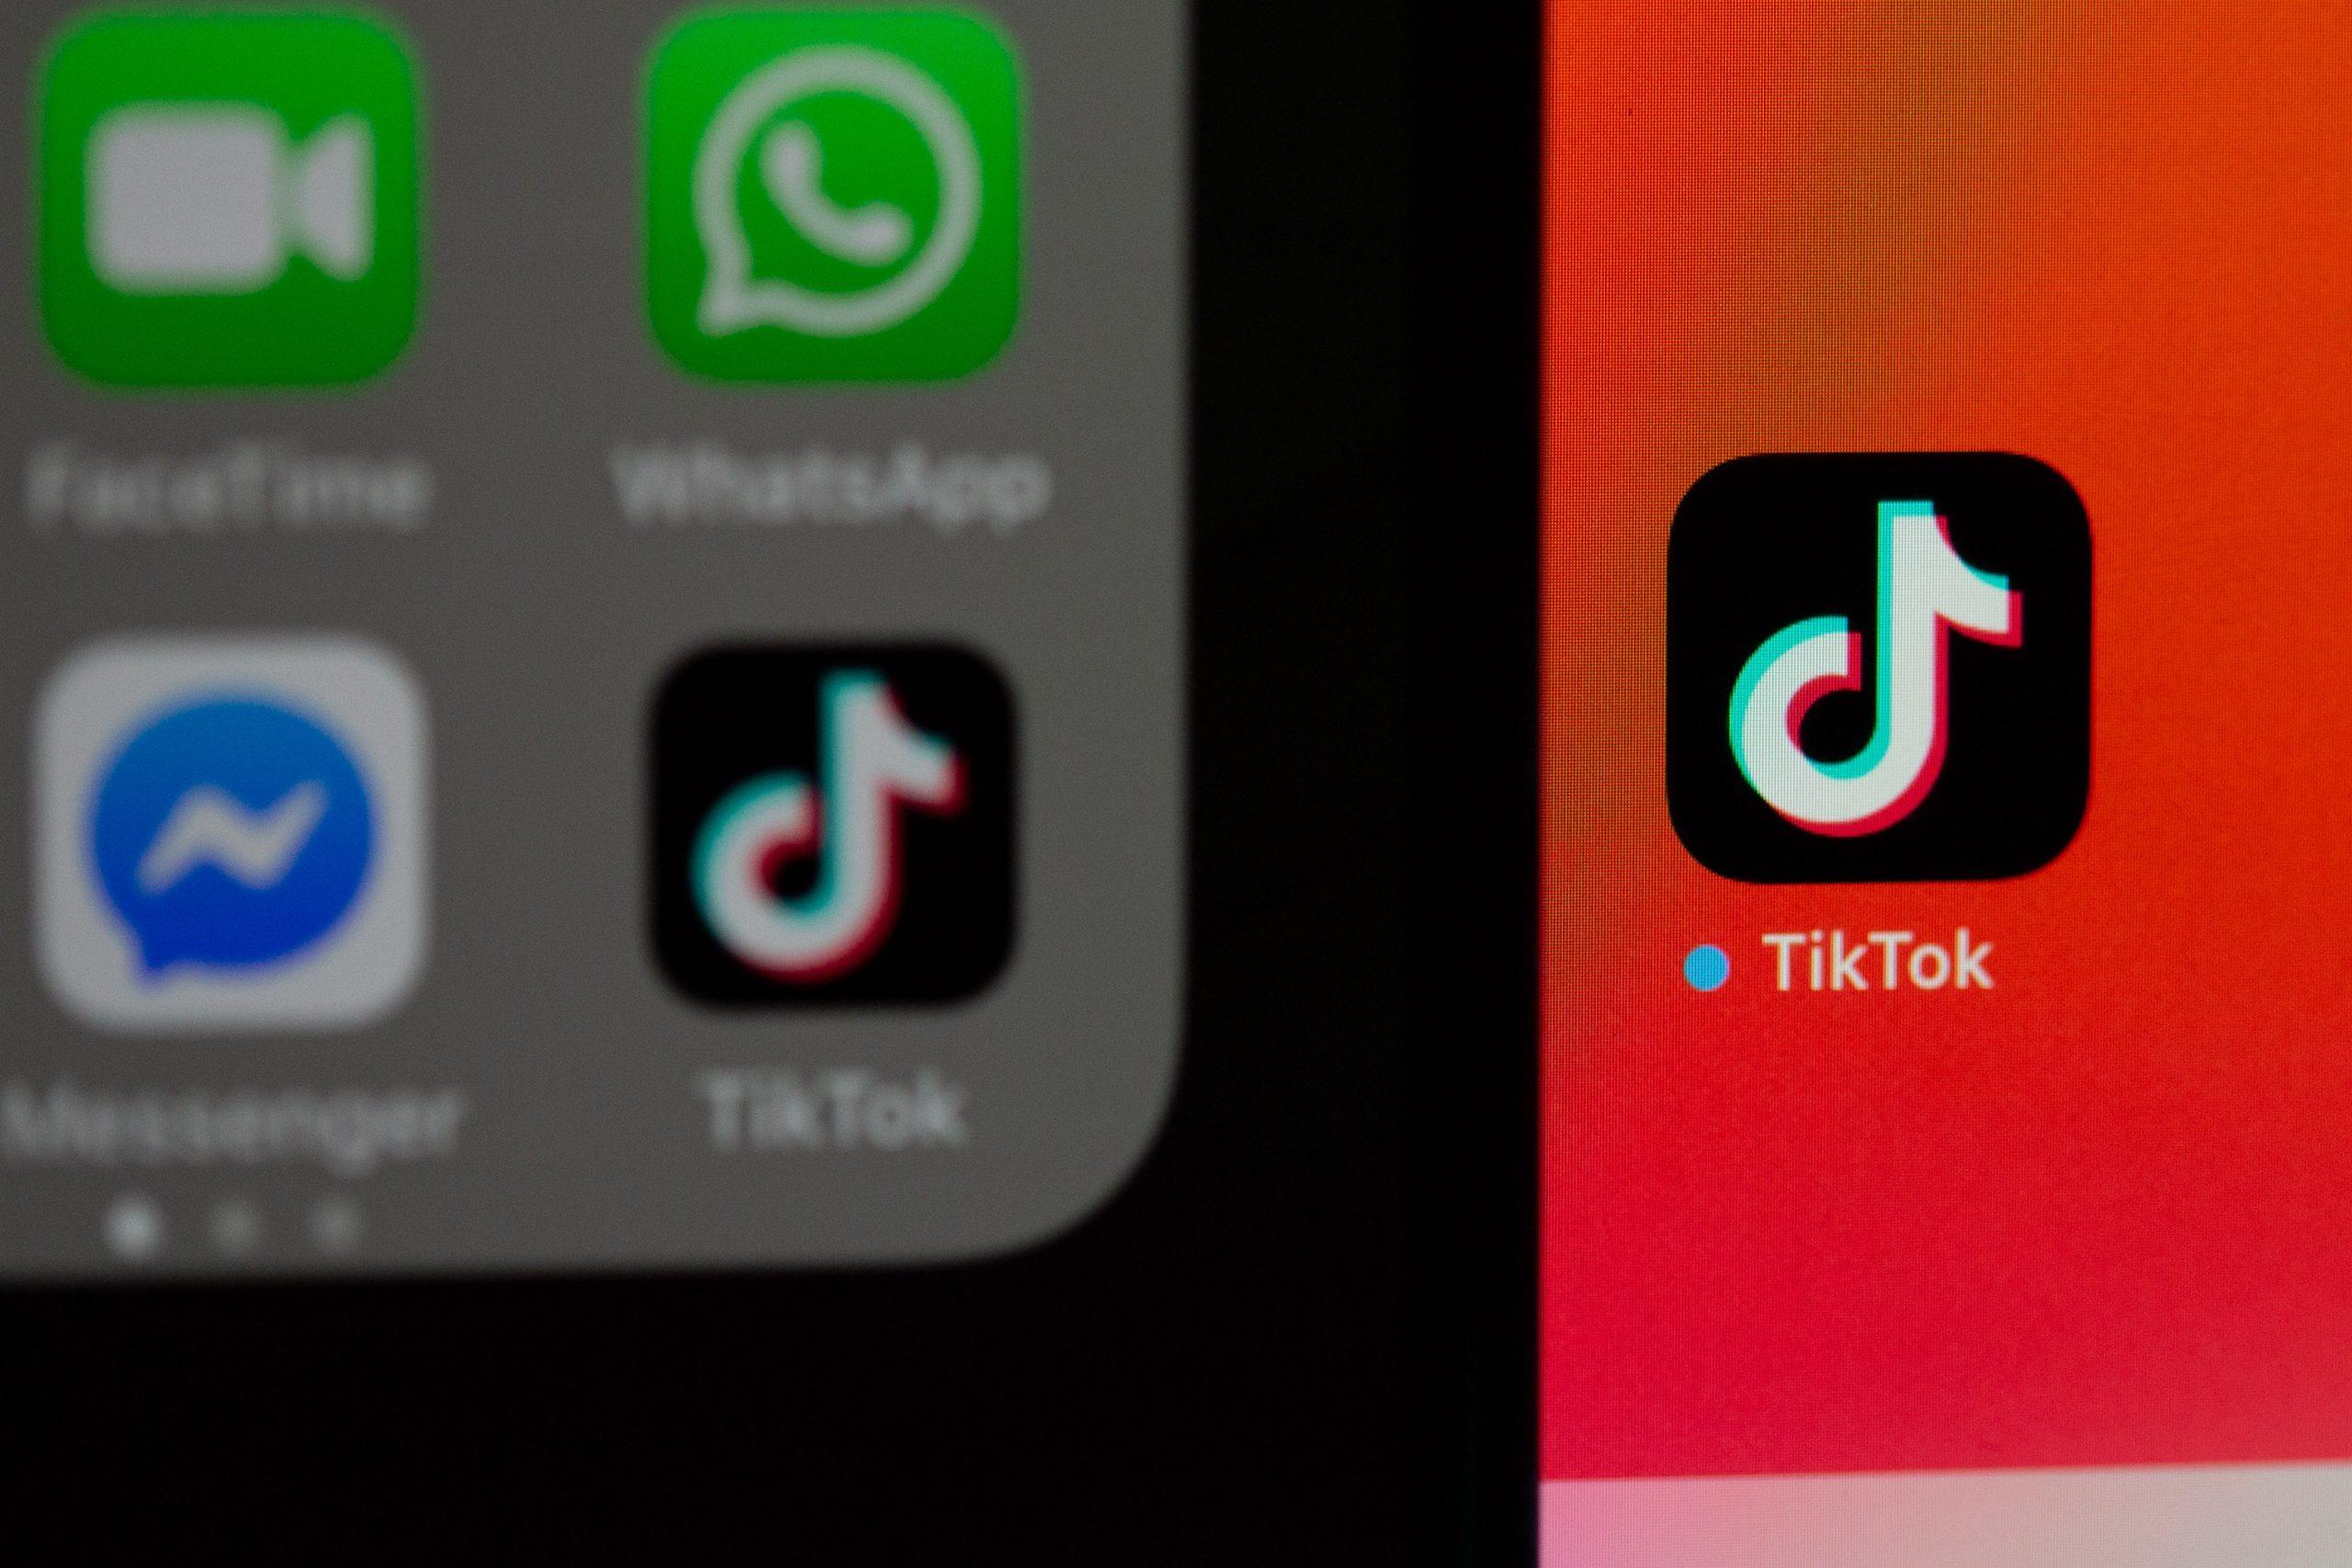 Si eres usuario de TikTok, te interesa